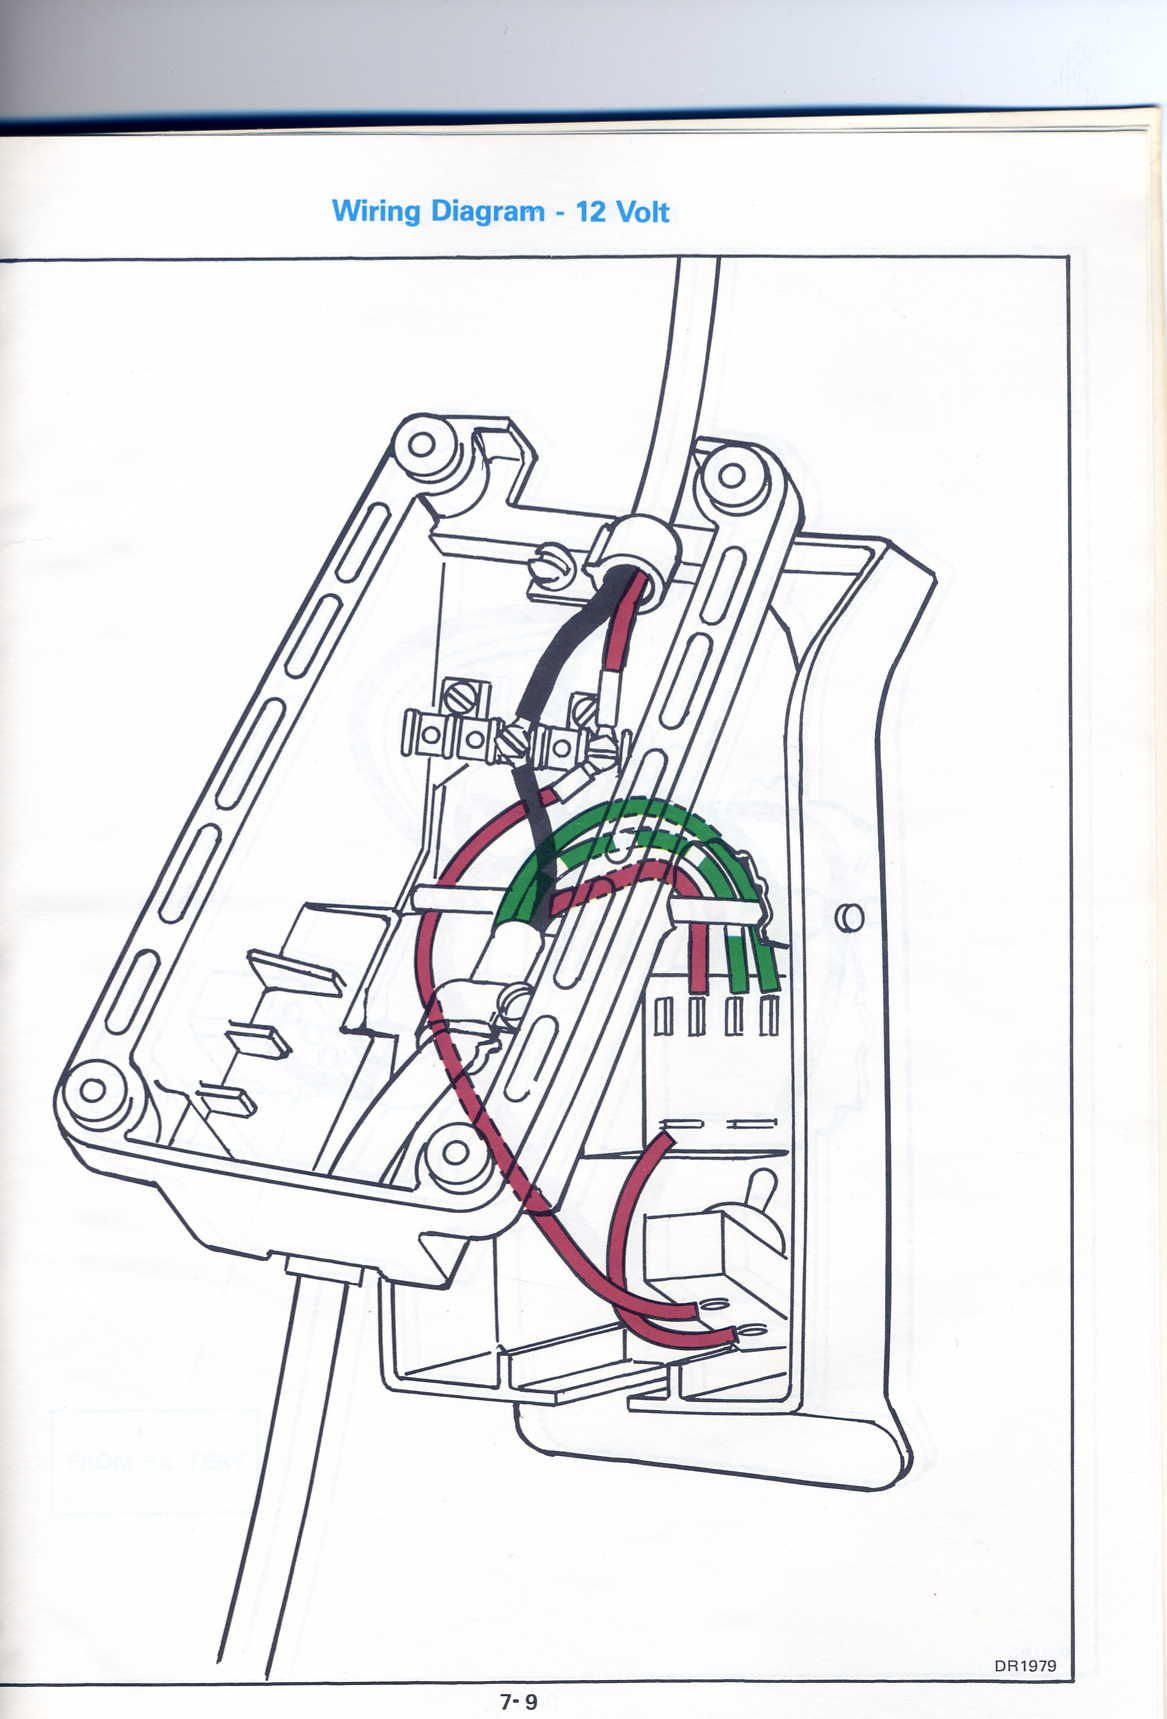 hight resolution of motorguide trolling motor wiring diagram trying to repair a friendstrolling motor foot pedel wiring diagram